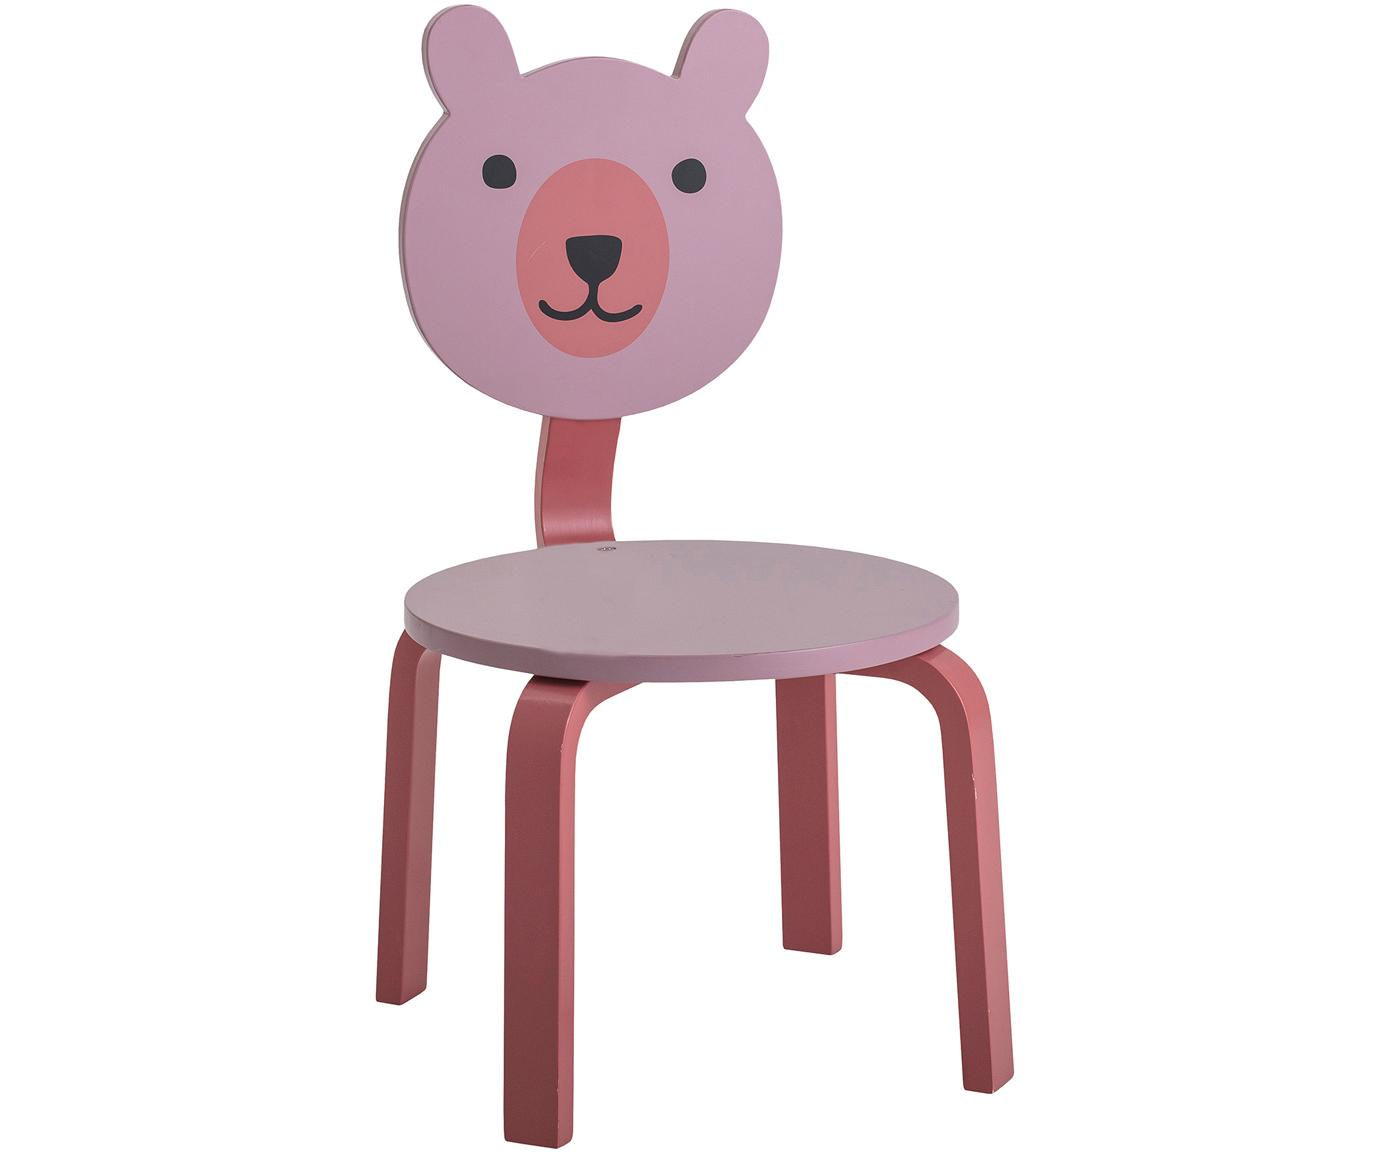 Silla infantil Bear, Tablero de fibras de densidad media(MDF), pintado, Tonos rosas, An 32 x Al 60 cm